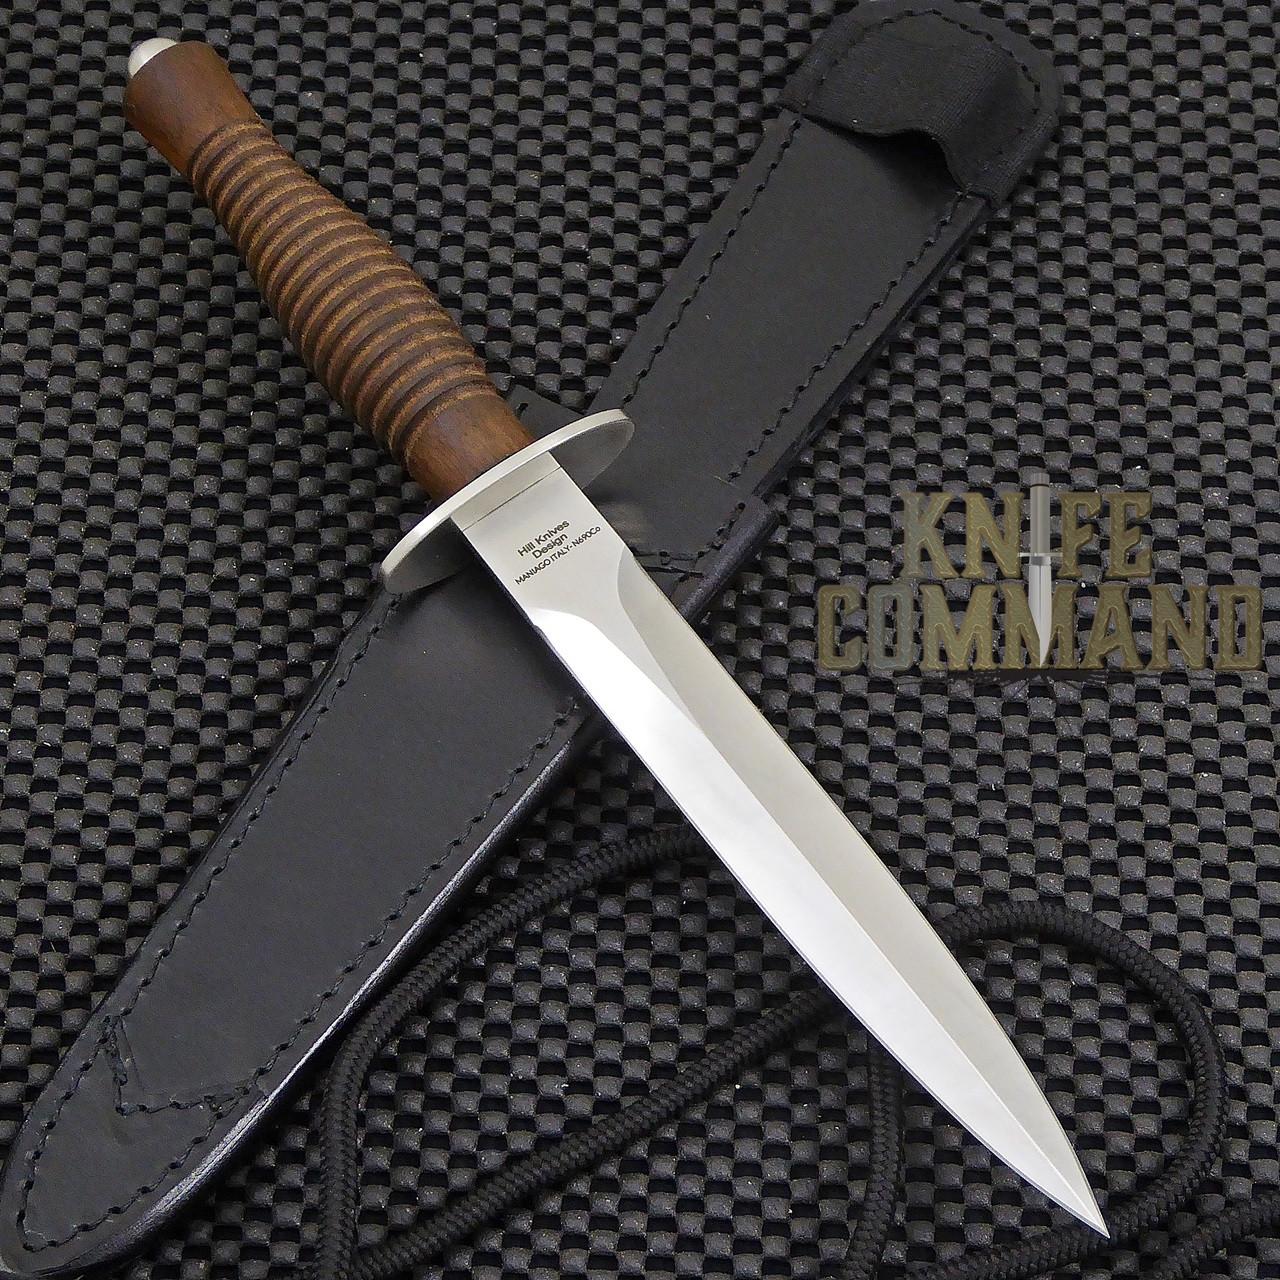 Fox Knives FX-593 Fairbairn Sykes Combat Dagger Knife Walnut.  Satin finished N690Co blade.